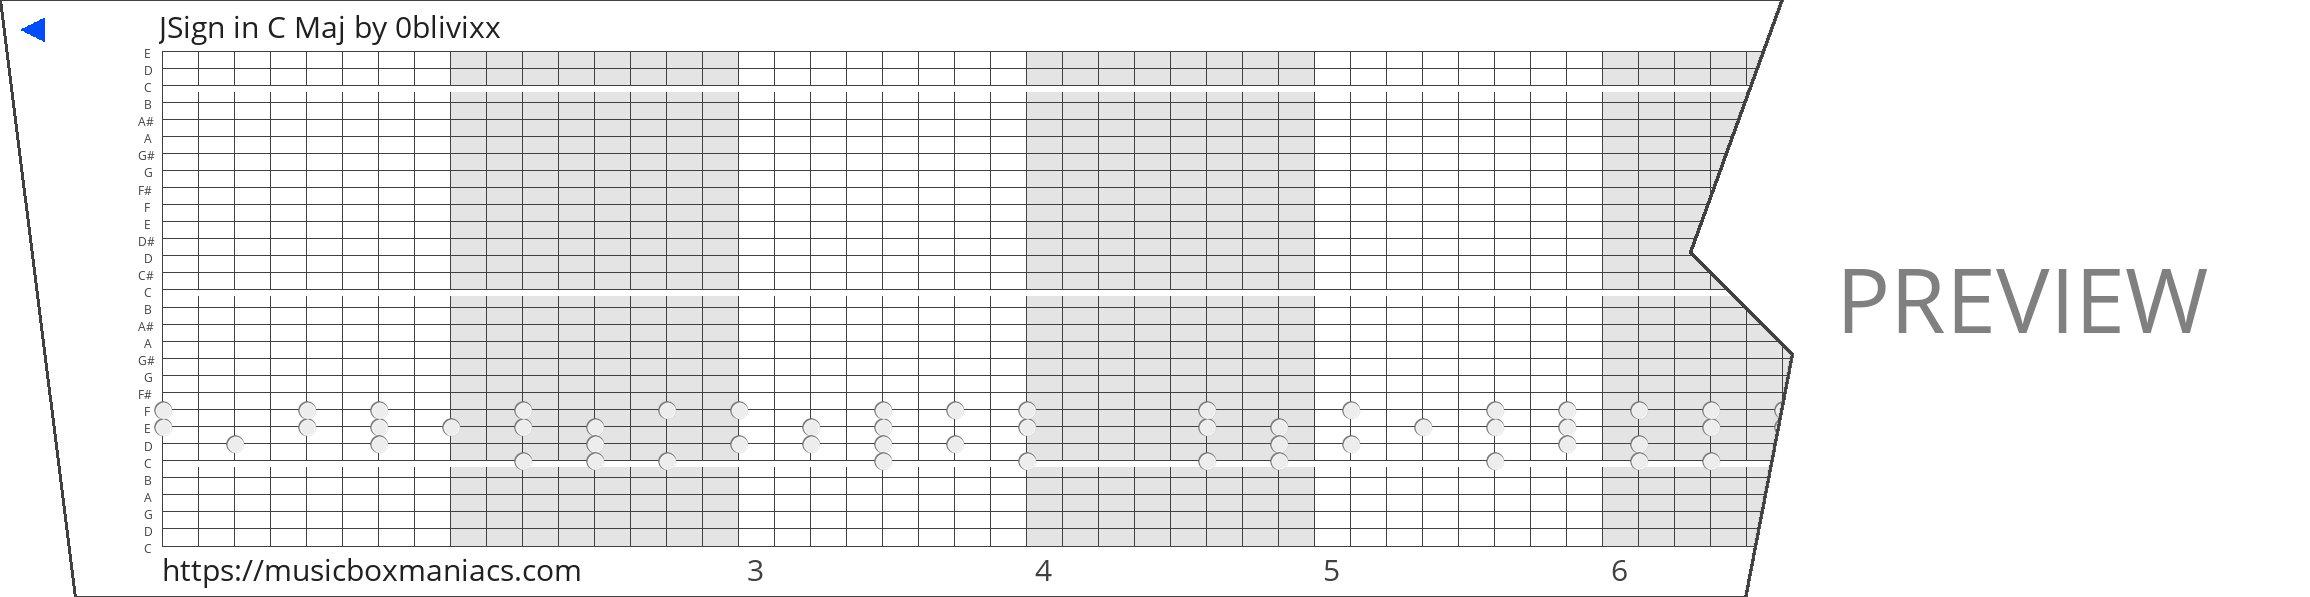 JSign in C Maj 30 note music box paper strip